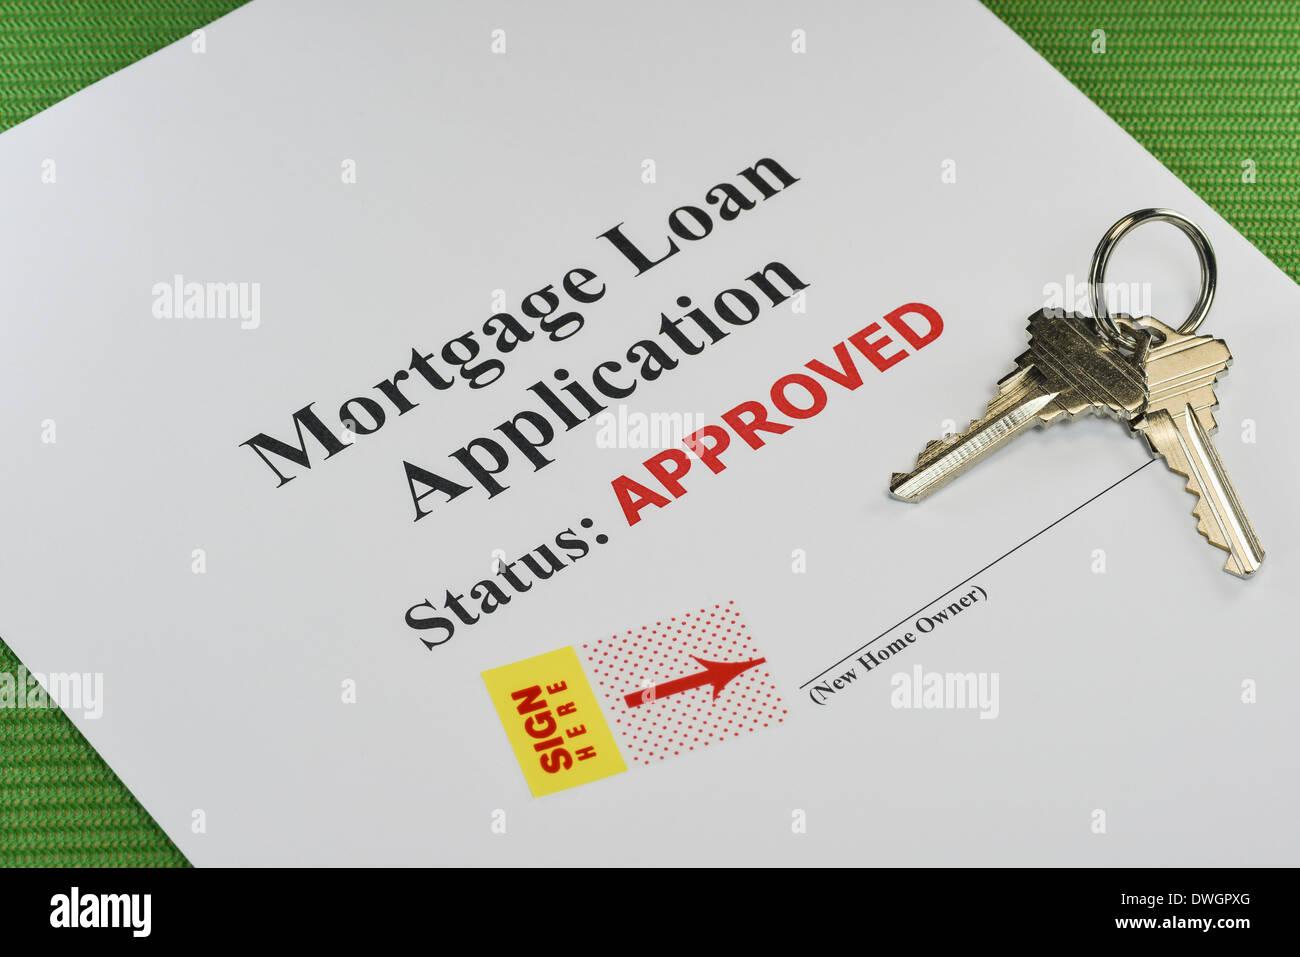 Mortgage Document Stockfotos & Mortgage Document Bilder - Alamy